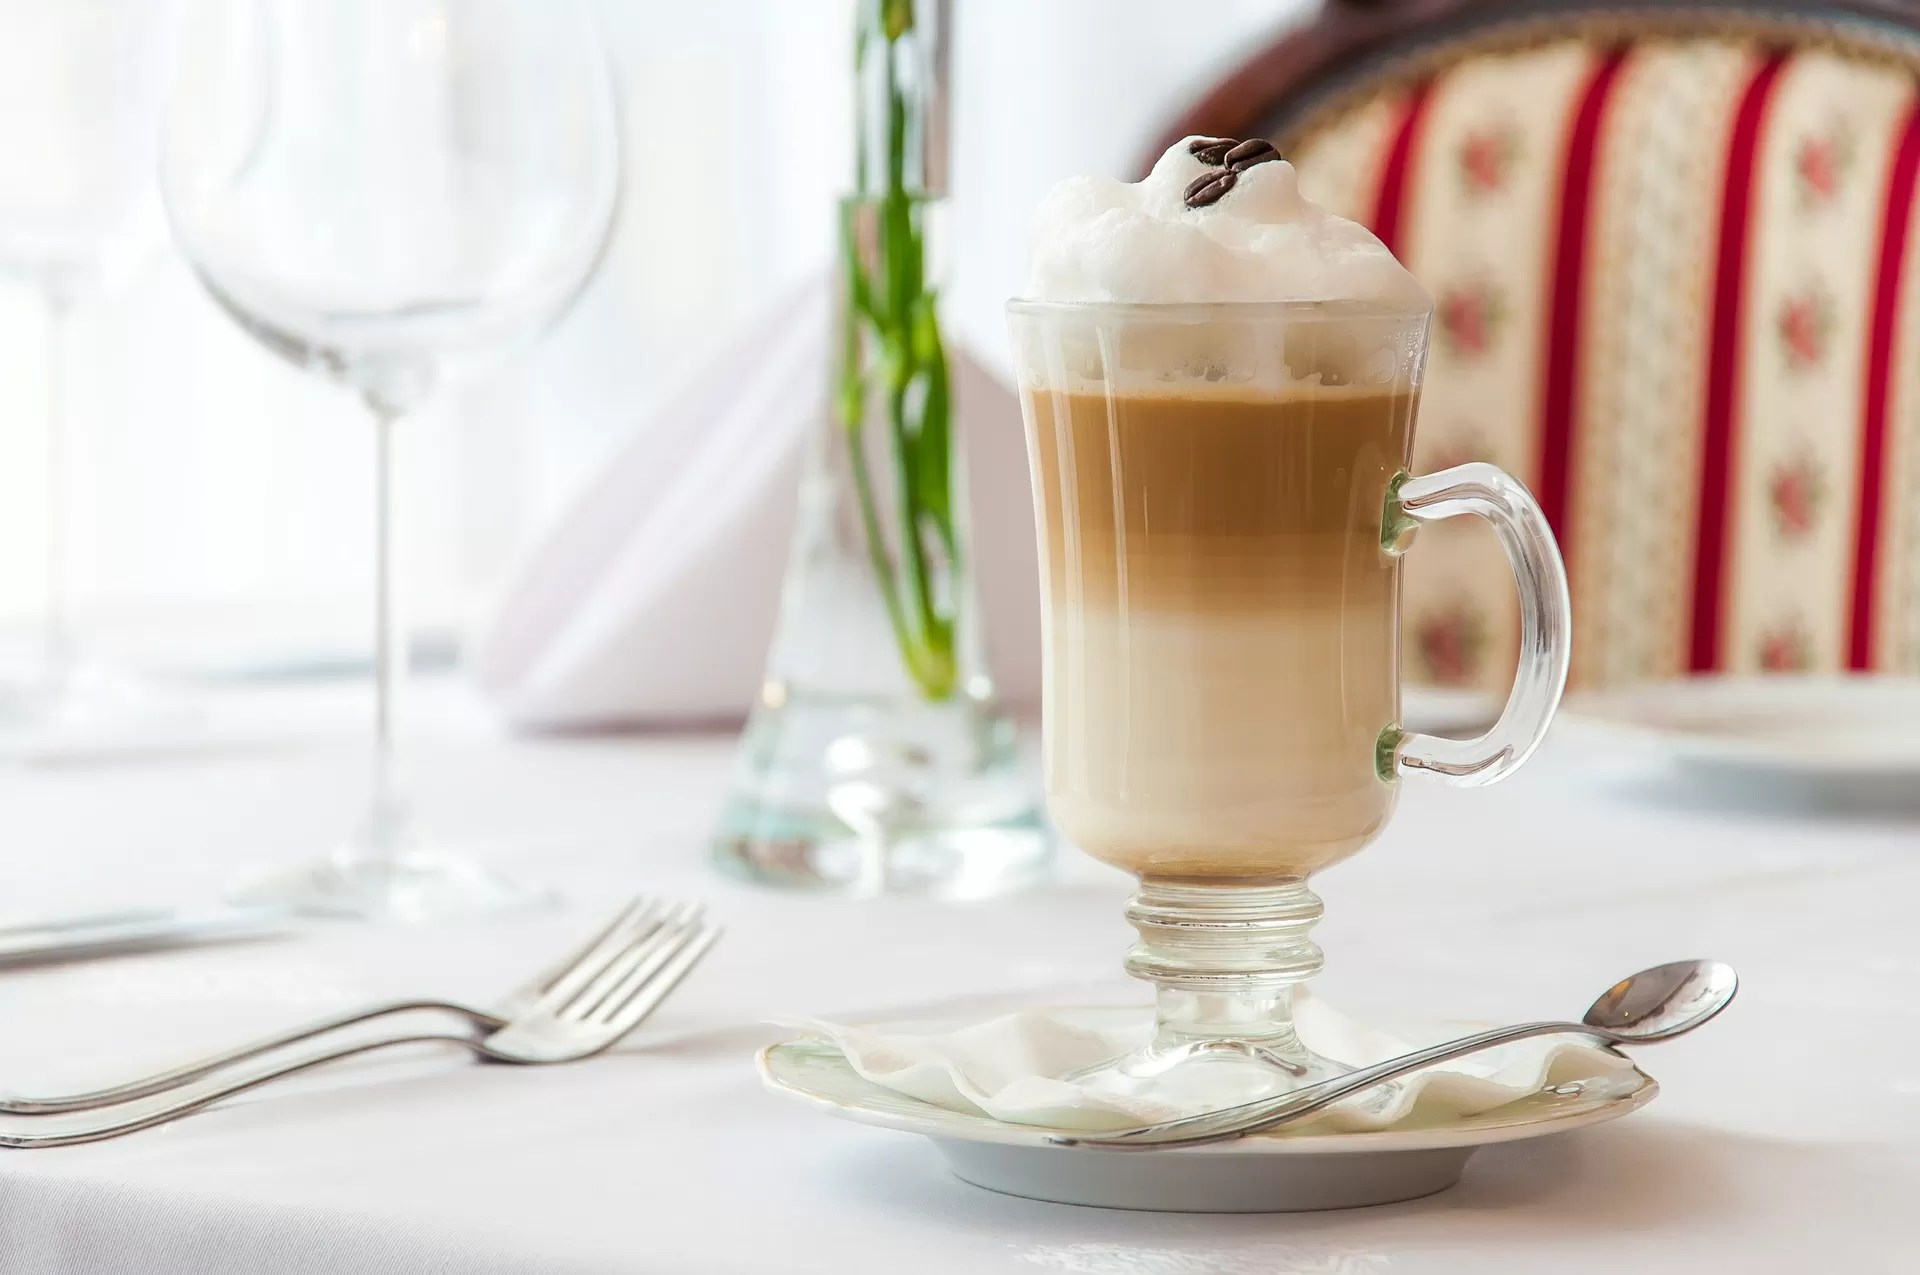 Panna e caffè